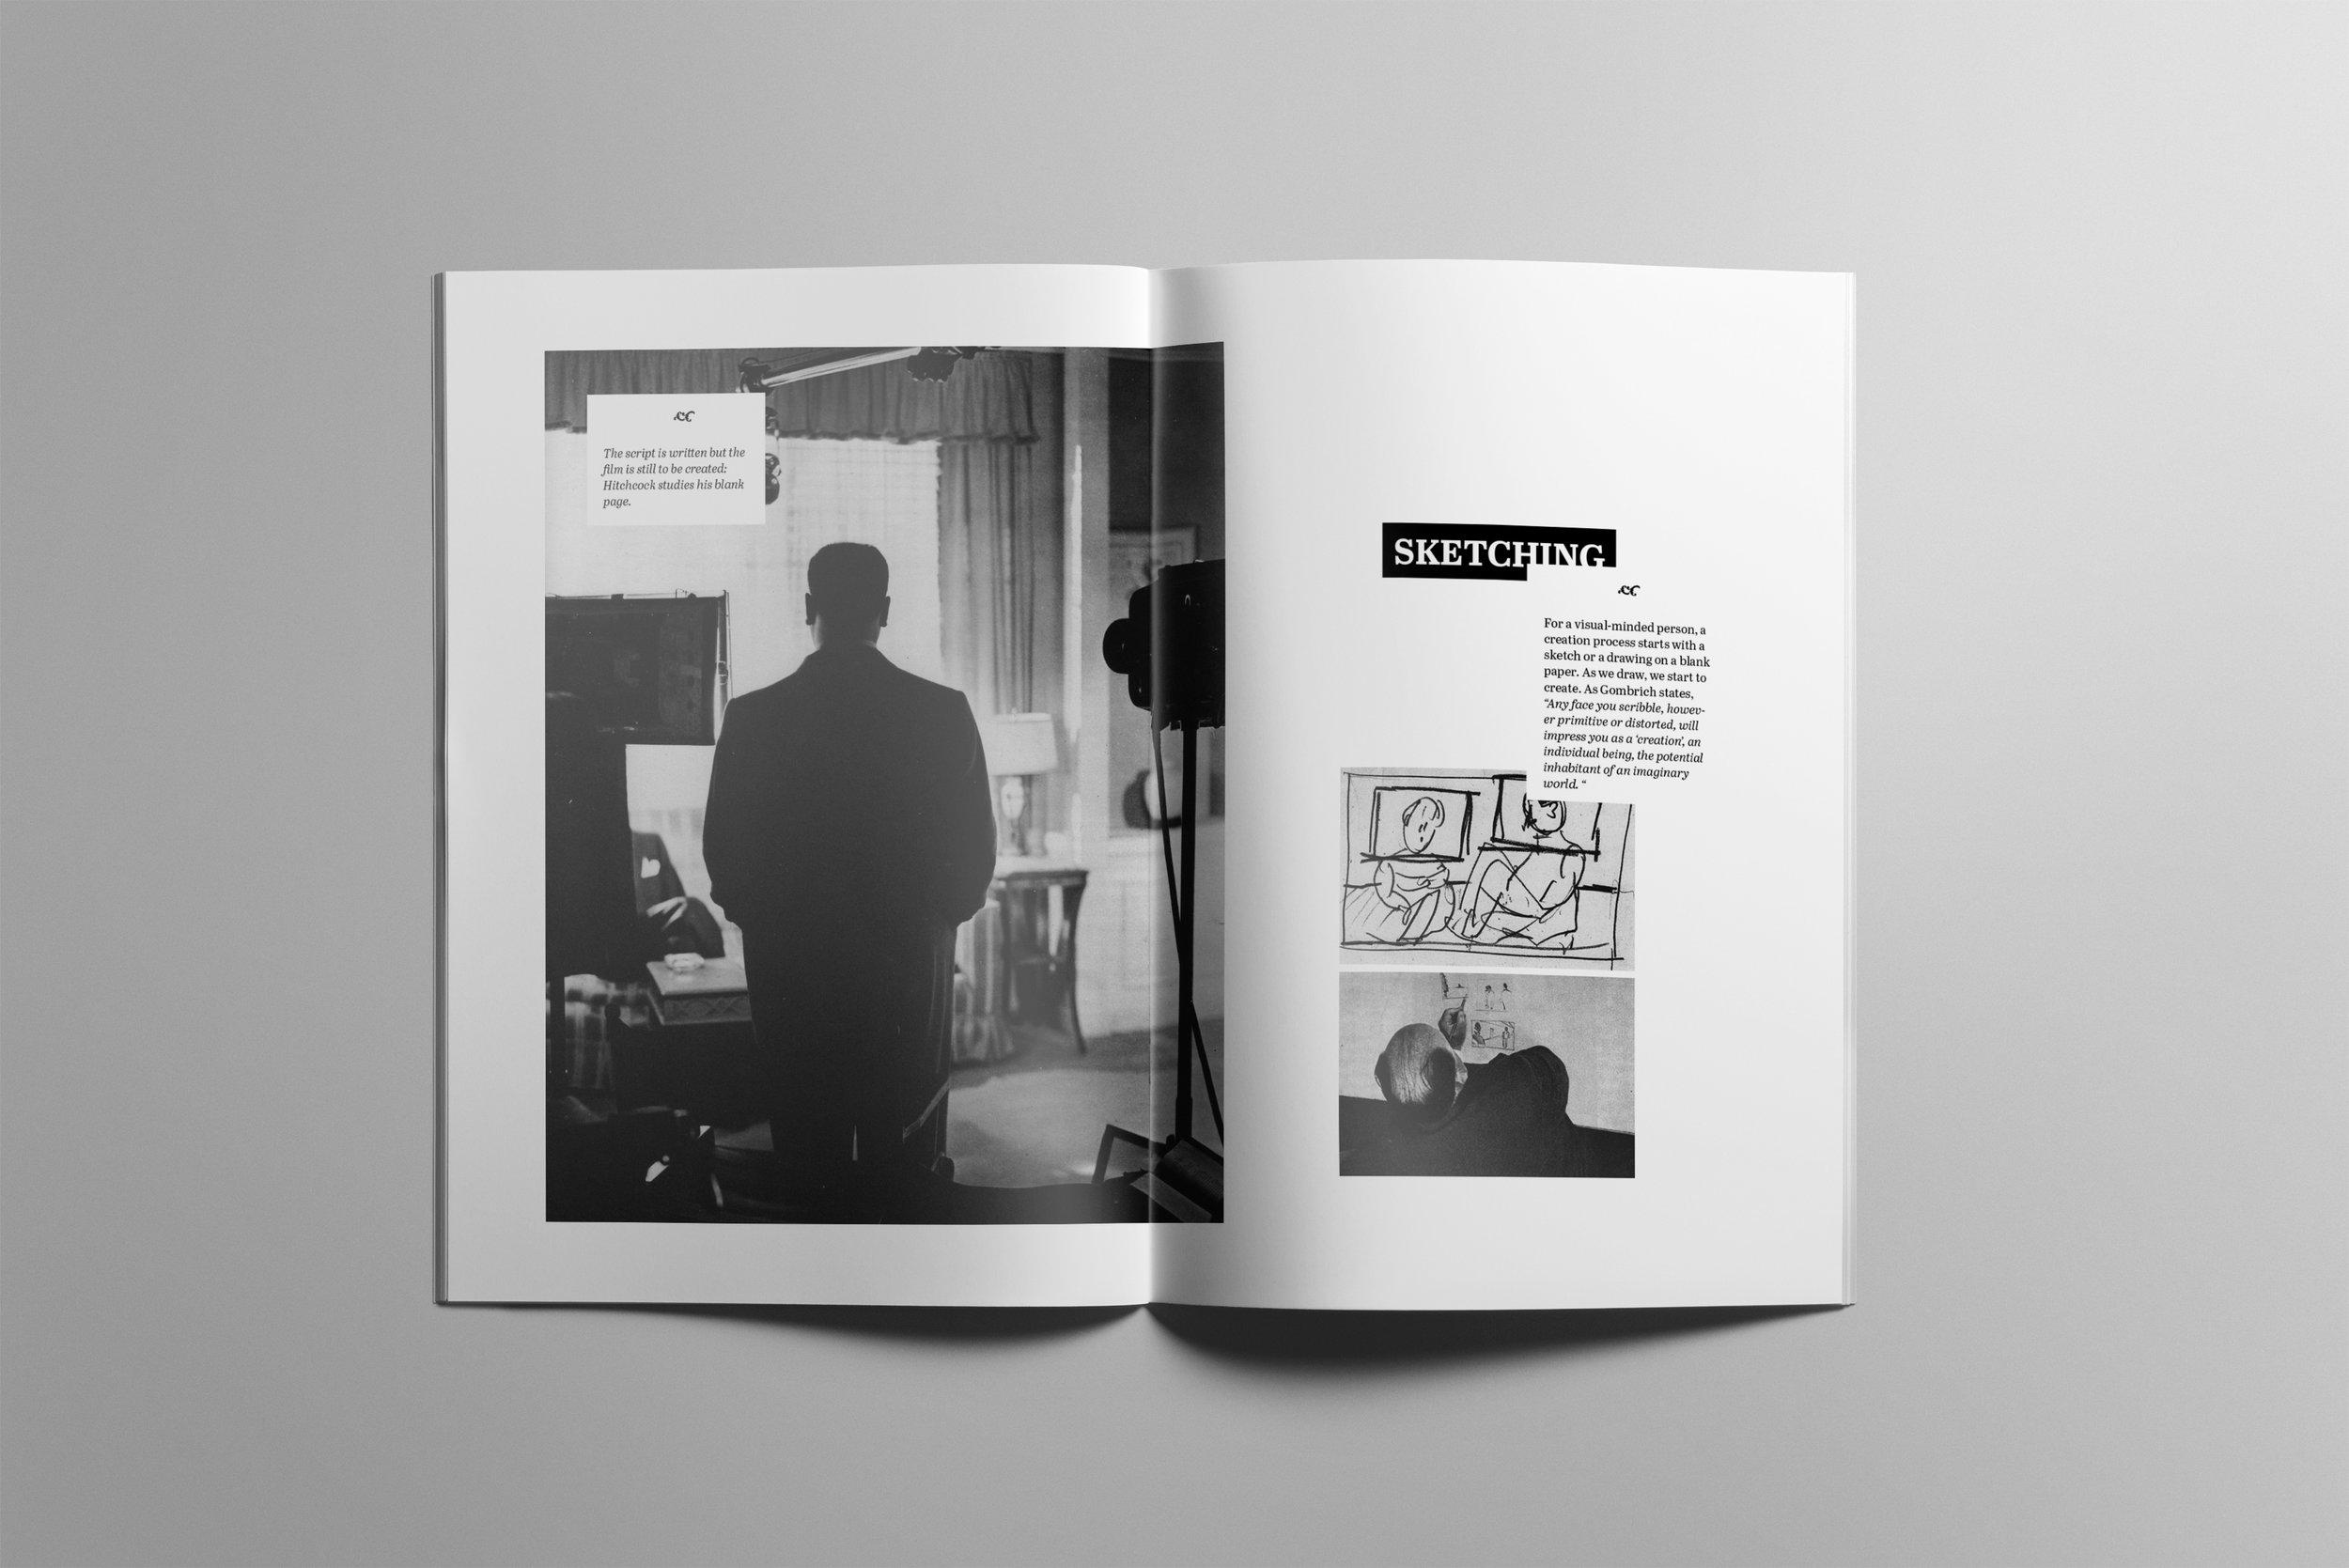 hpresents_booklet_mockup_04.jpg